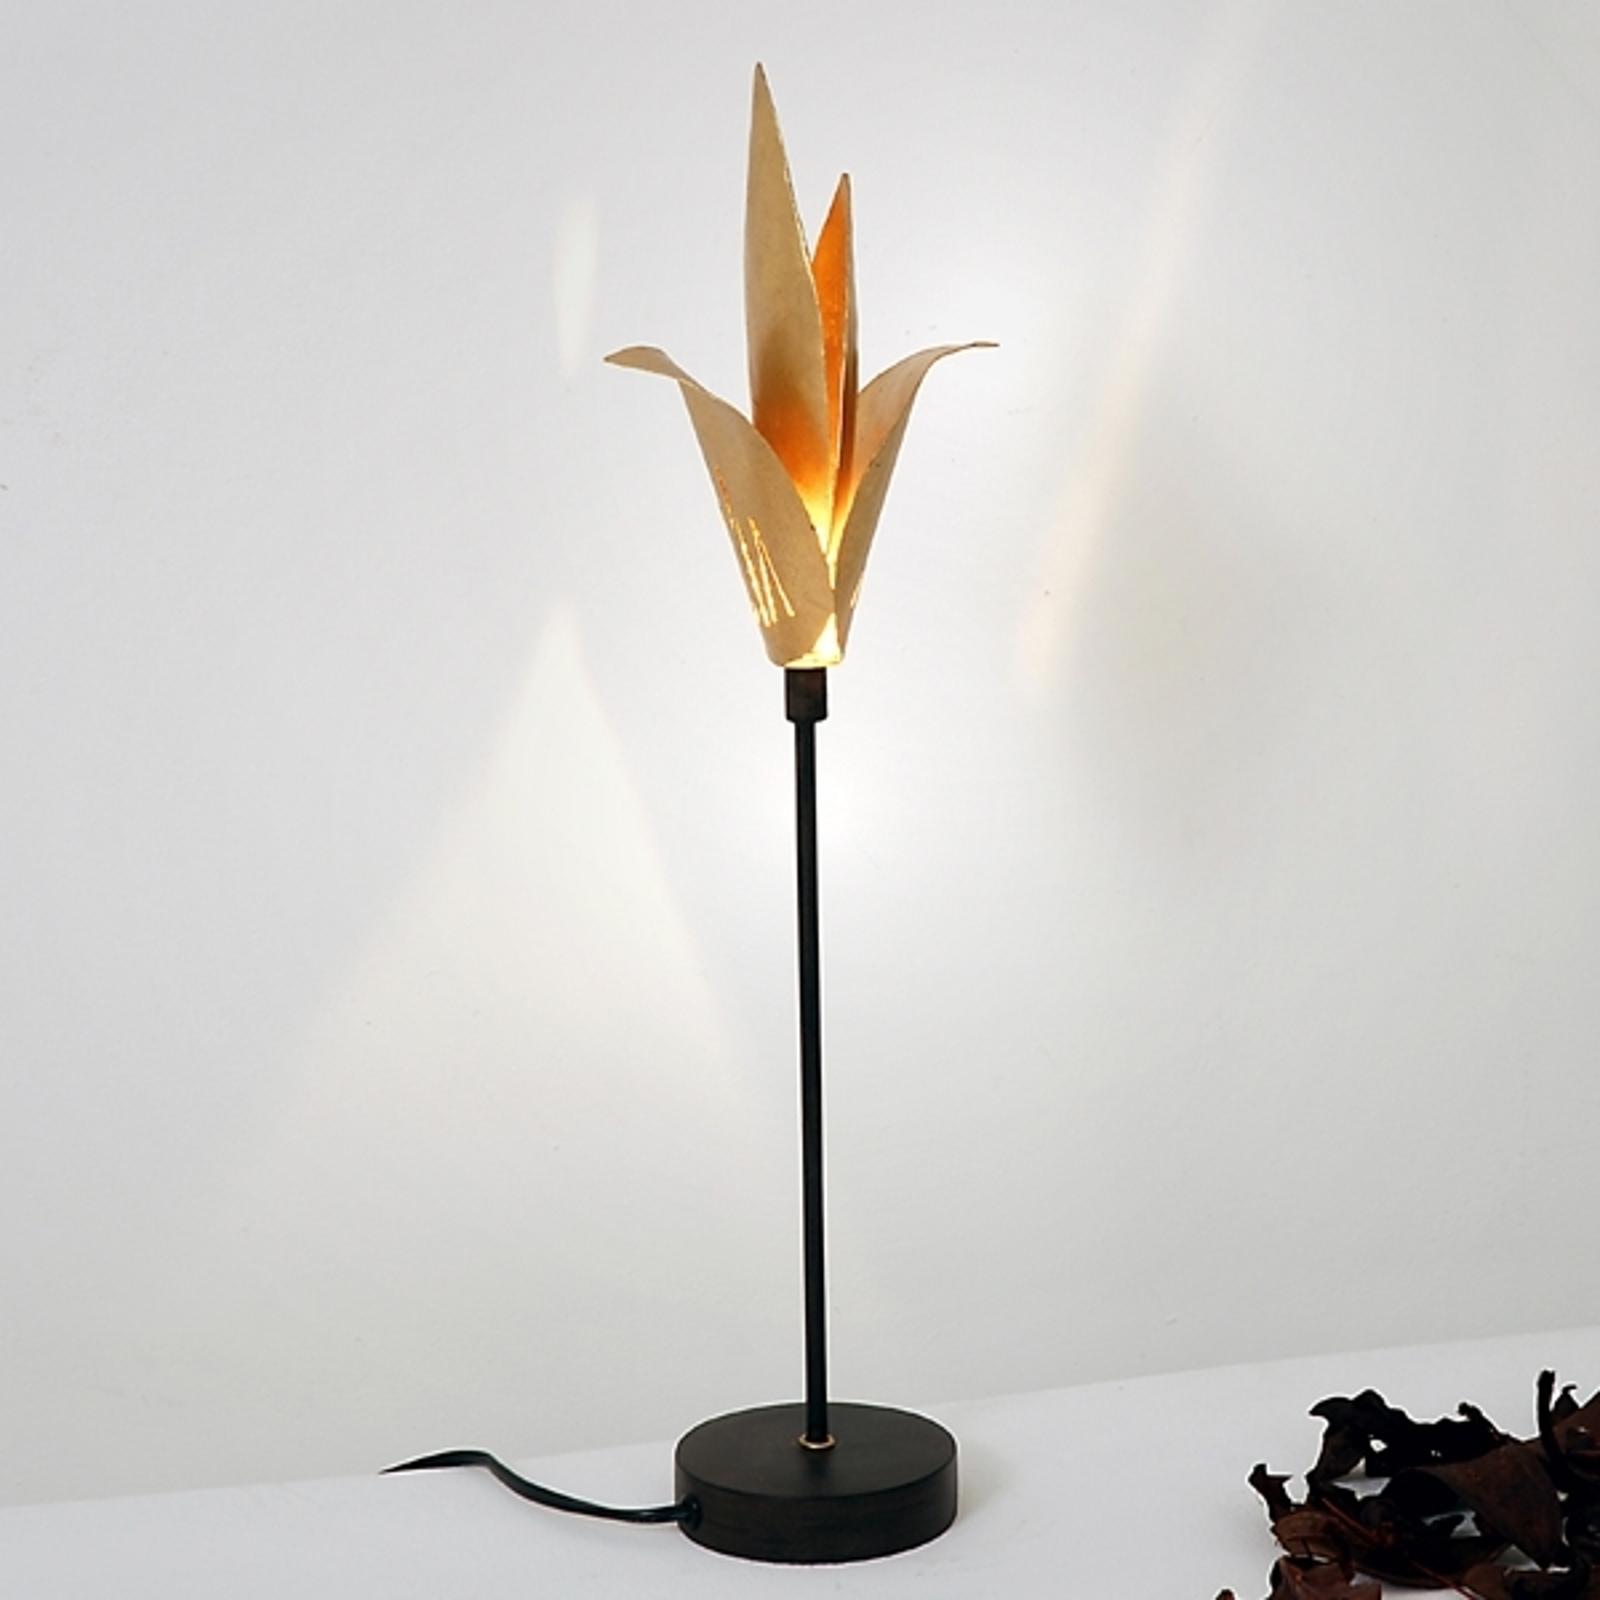 Exclusieve tafellamp AIRONE met gouden bloesem